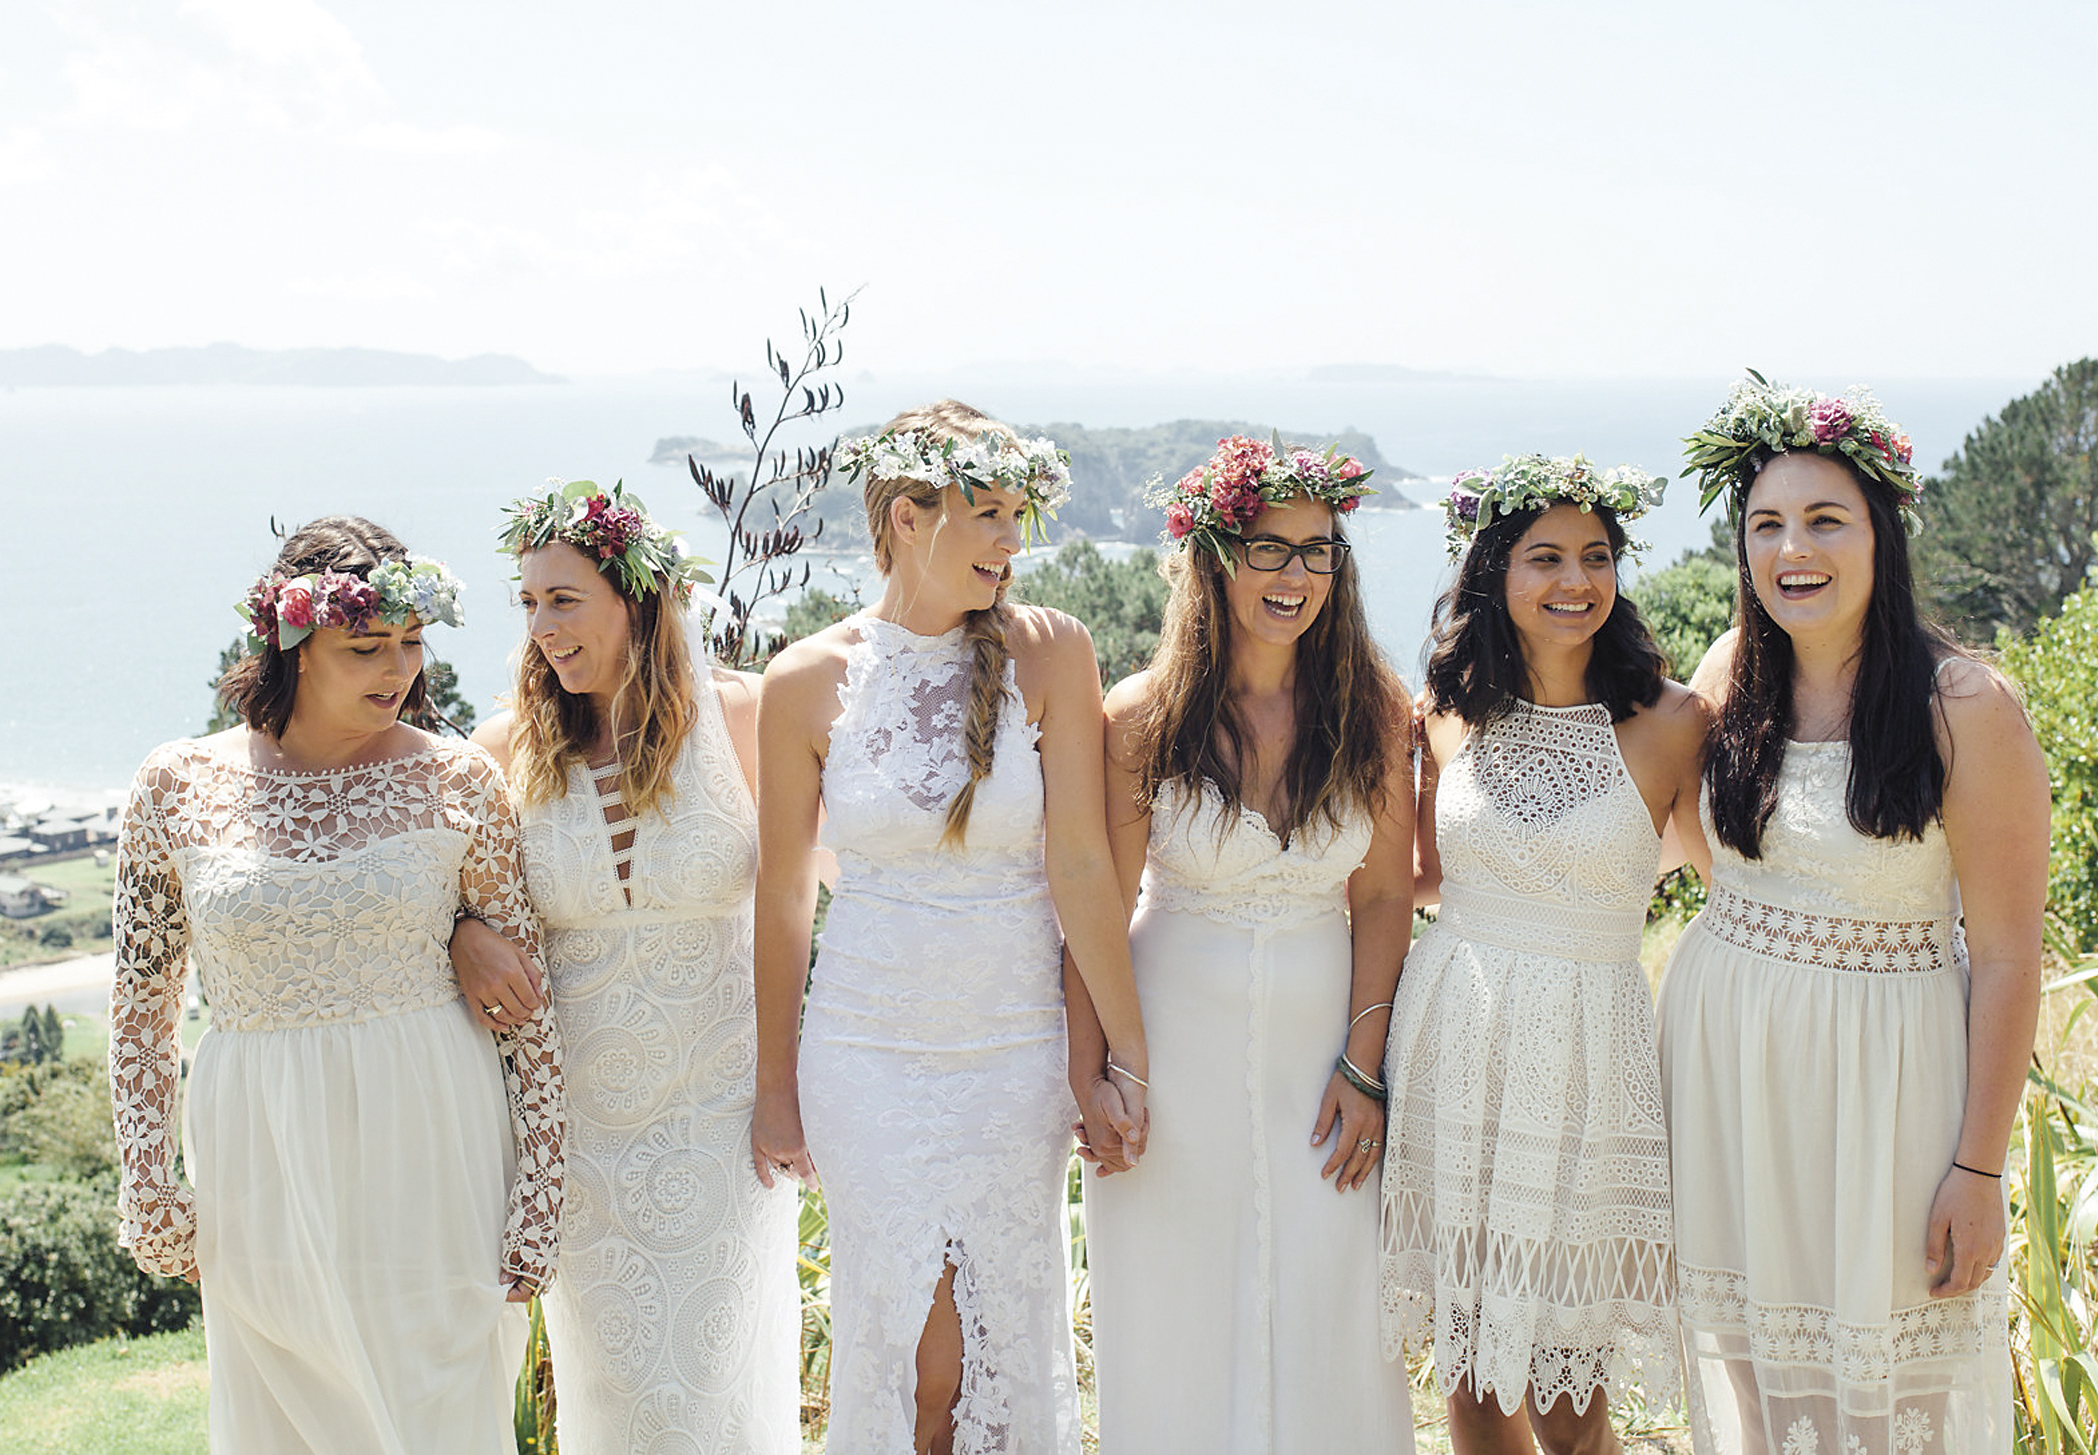 Bride & Groom Mag Aylish & Ryan's WEDDING 14.jpg